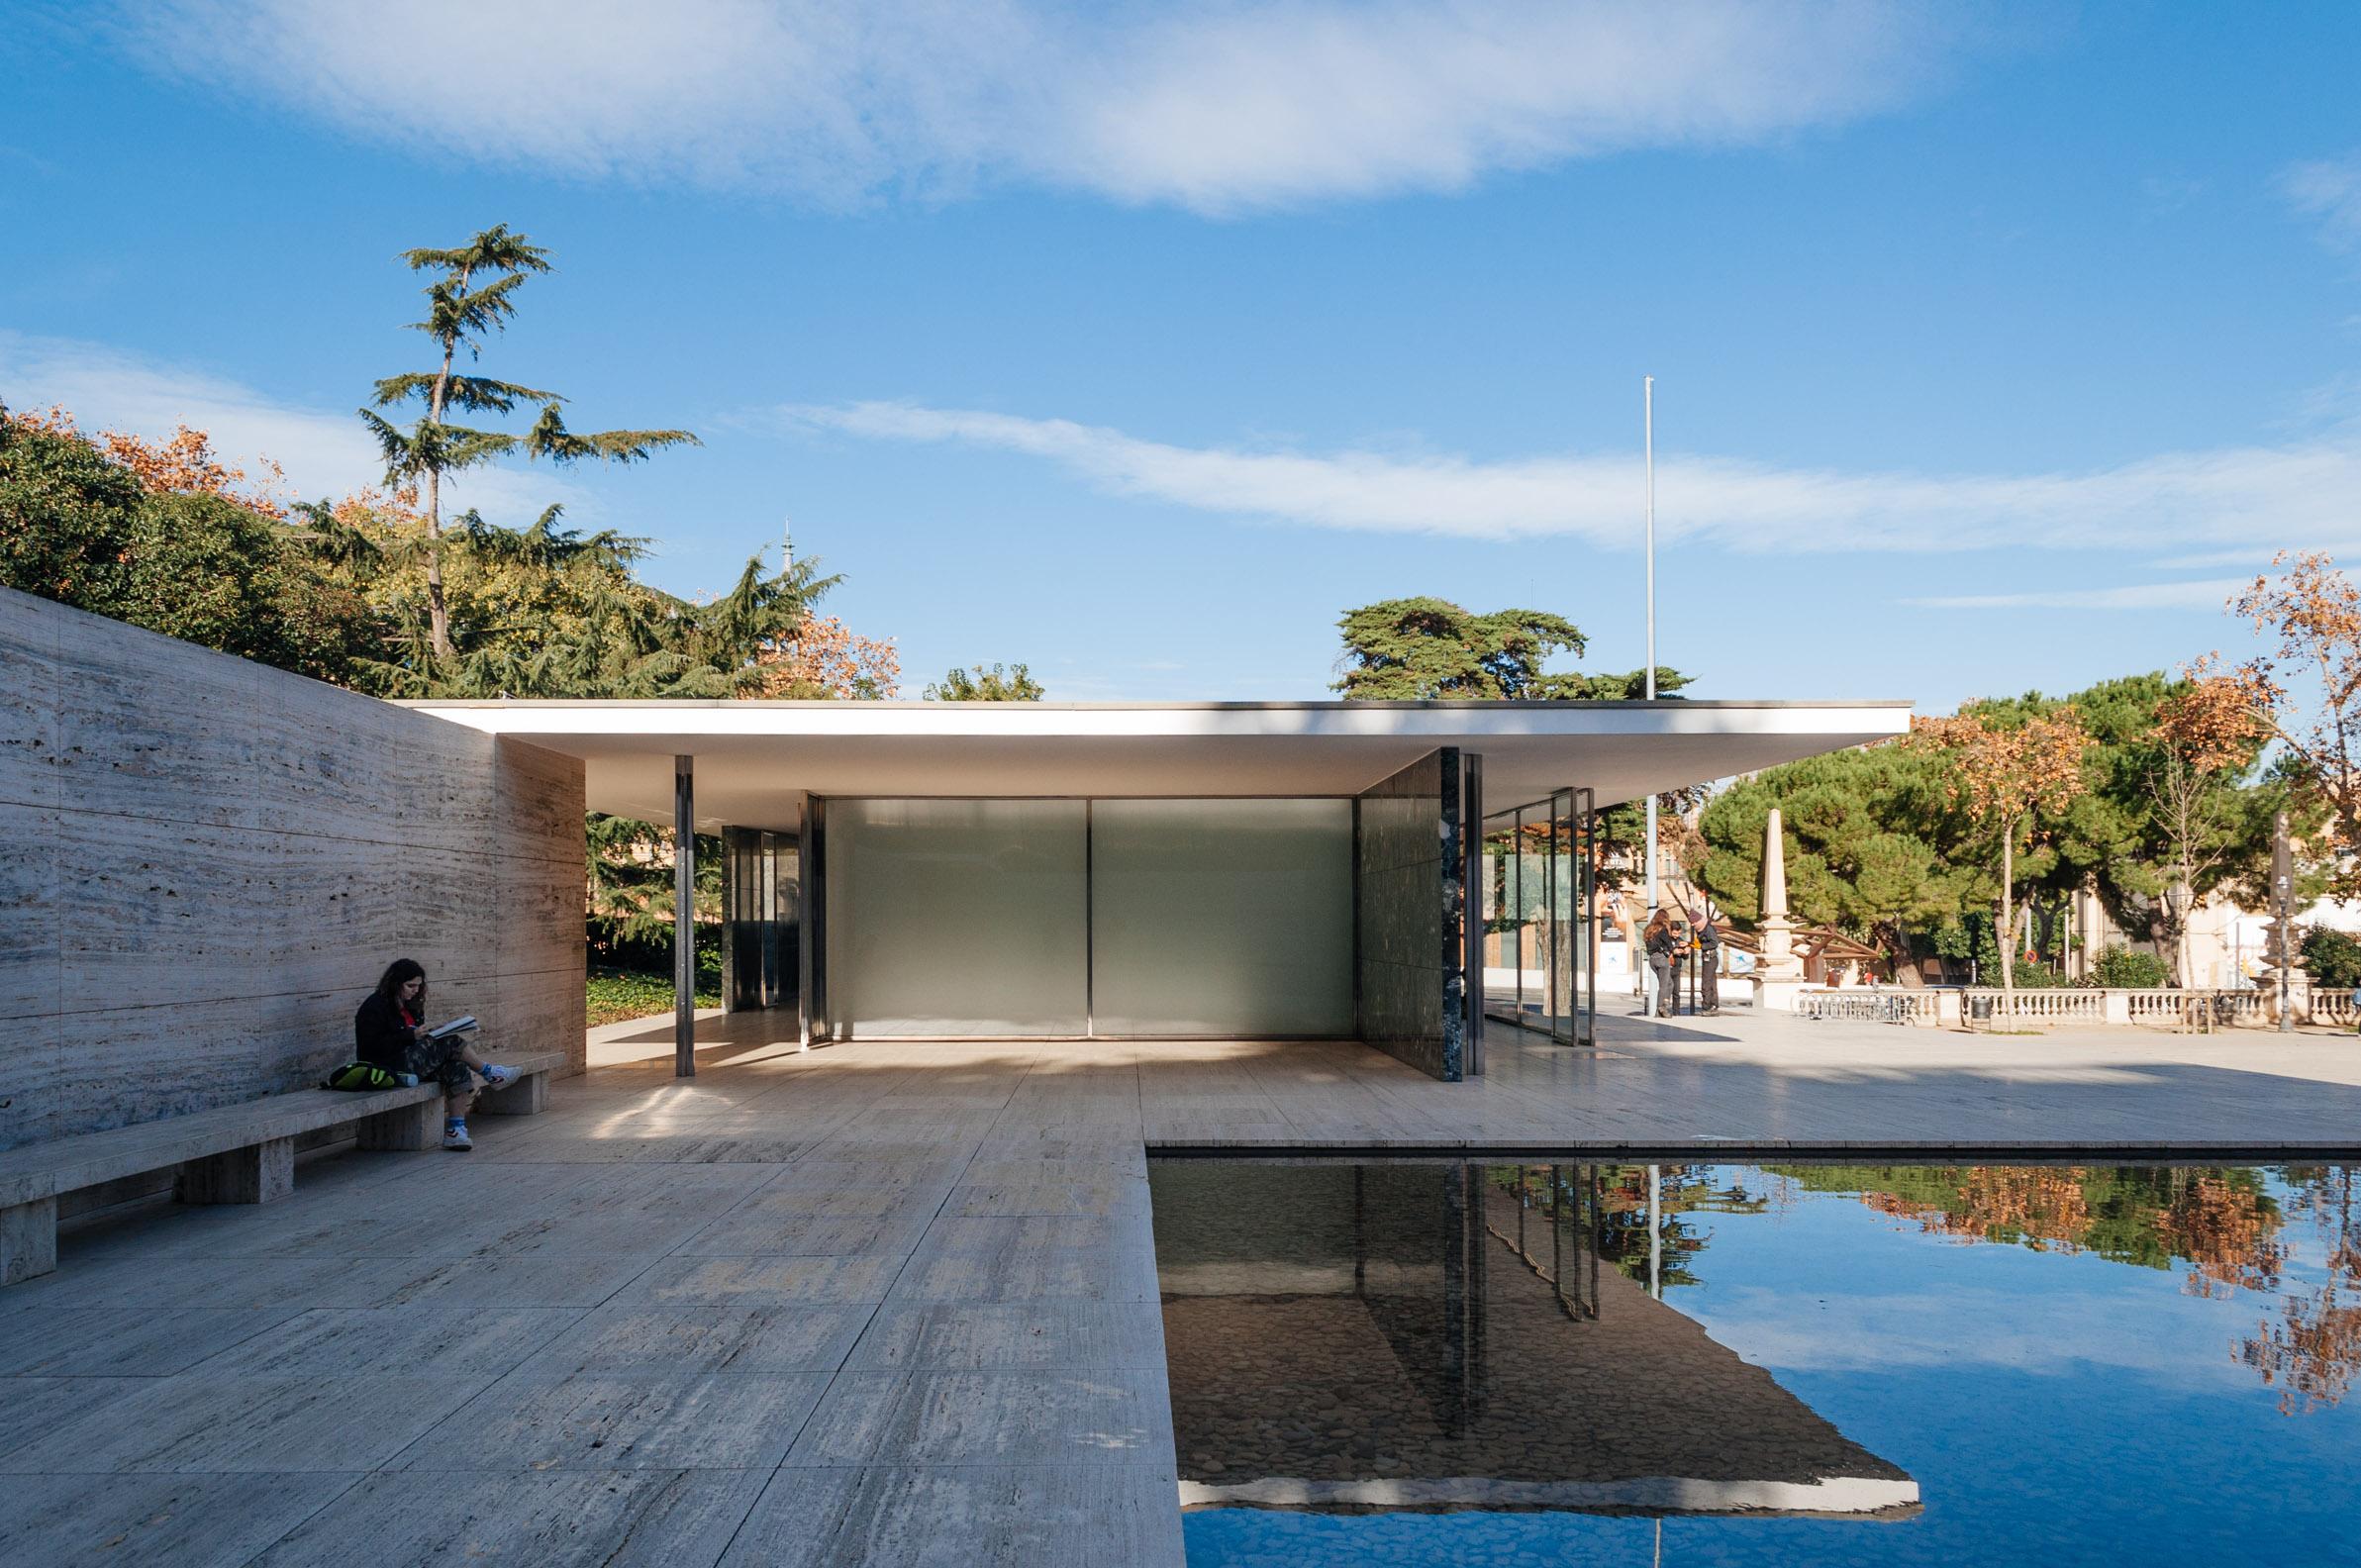 The Best Barcelona Pavilion